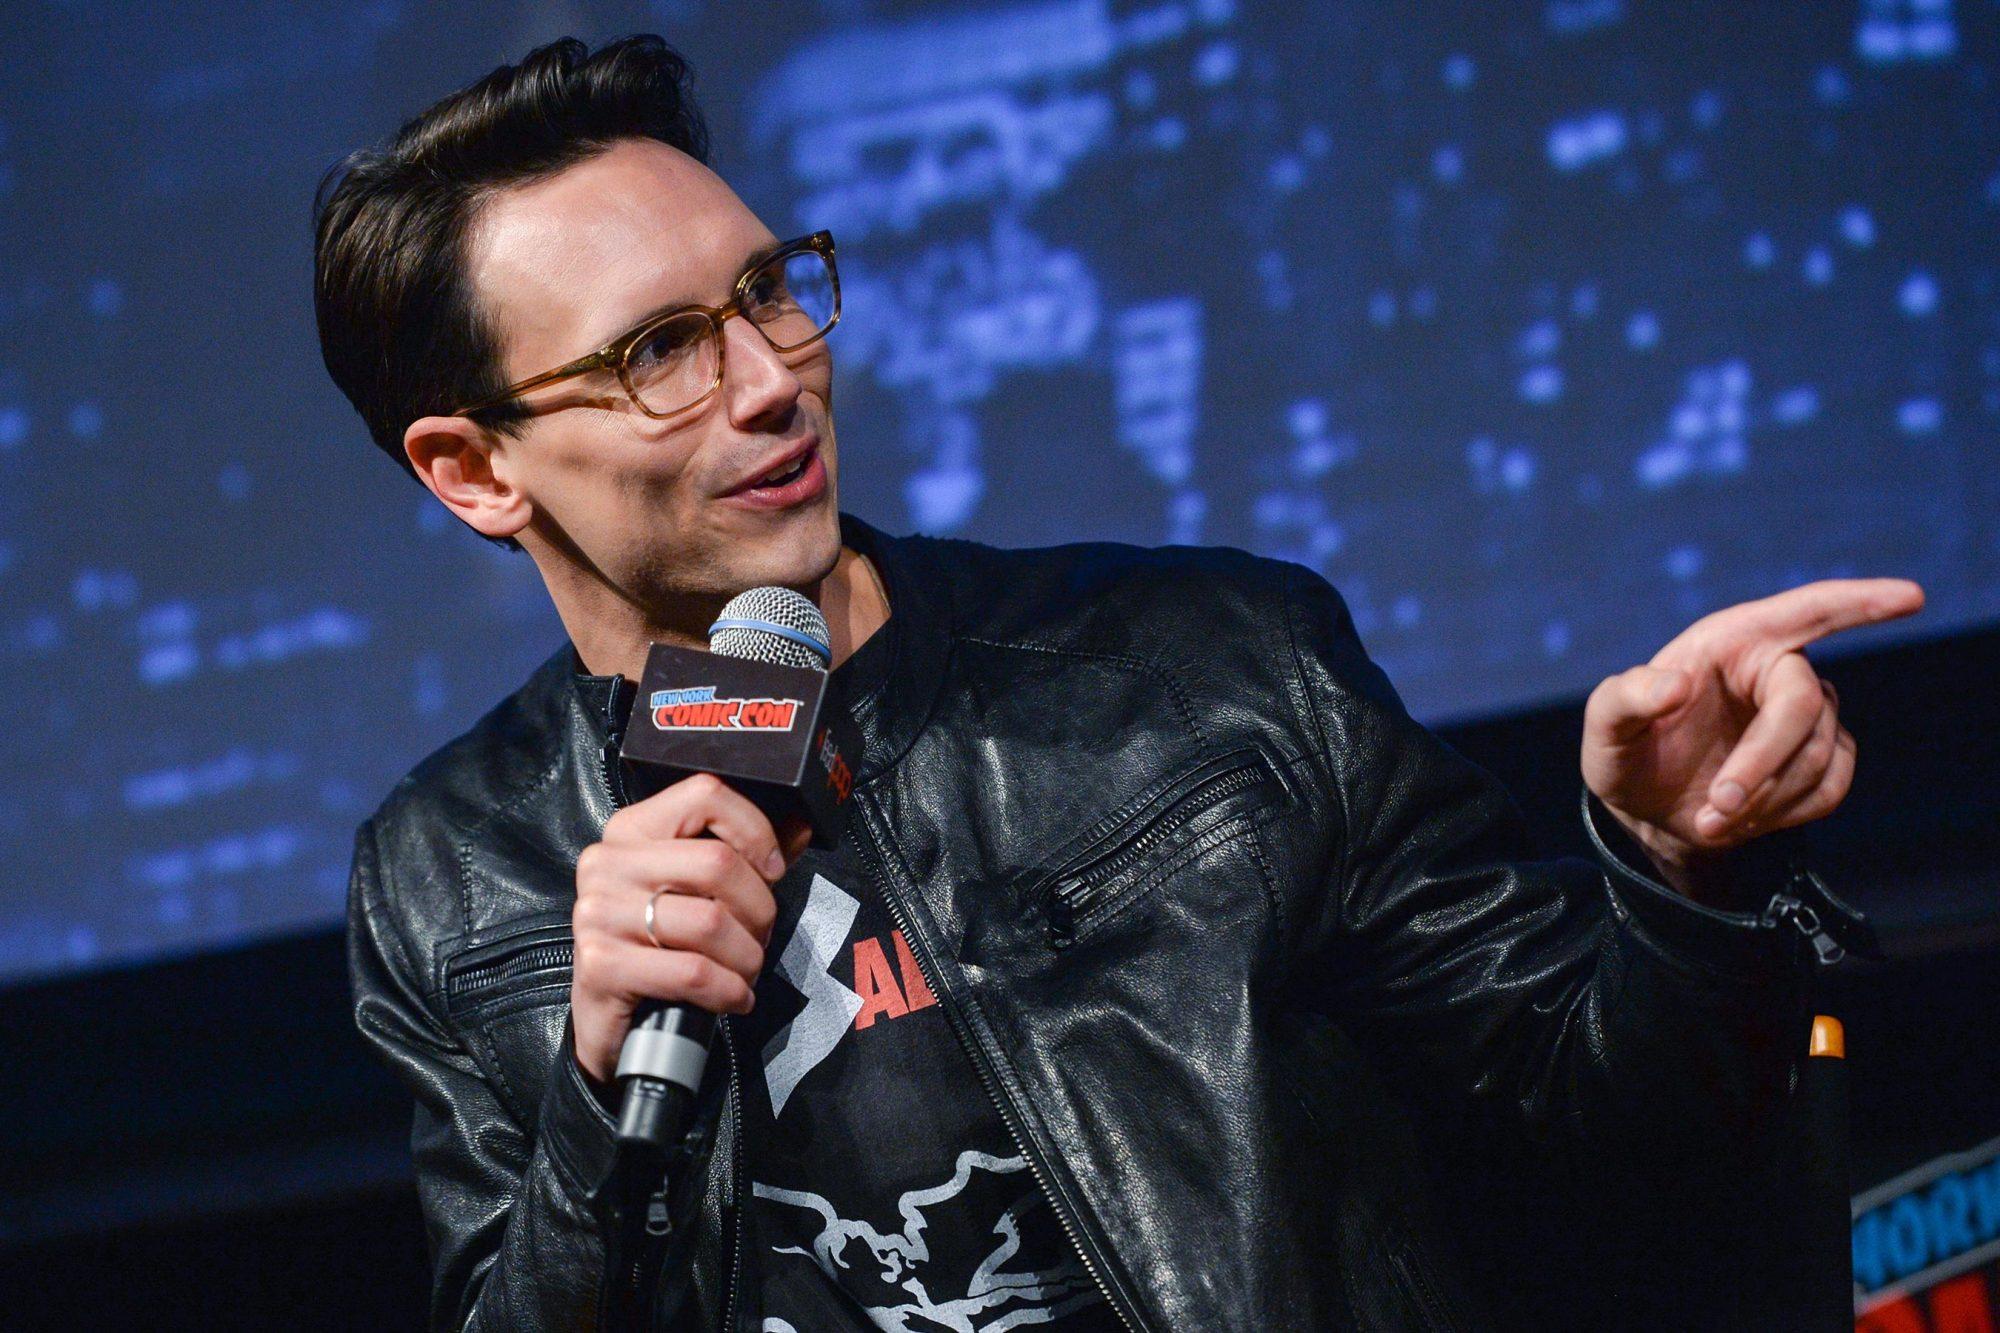 'Gotham' TV show panel, New York Comic Con, USA - 07 Oct 2018